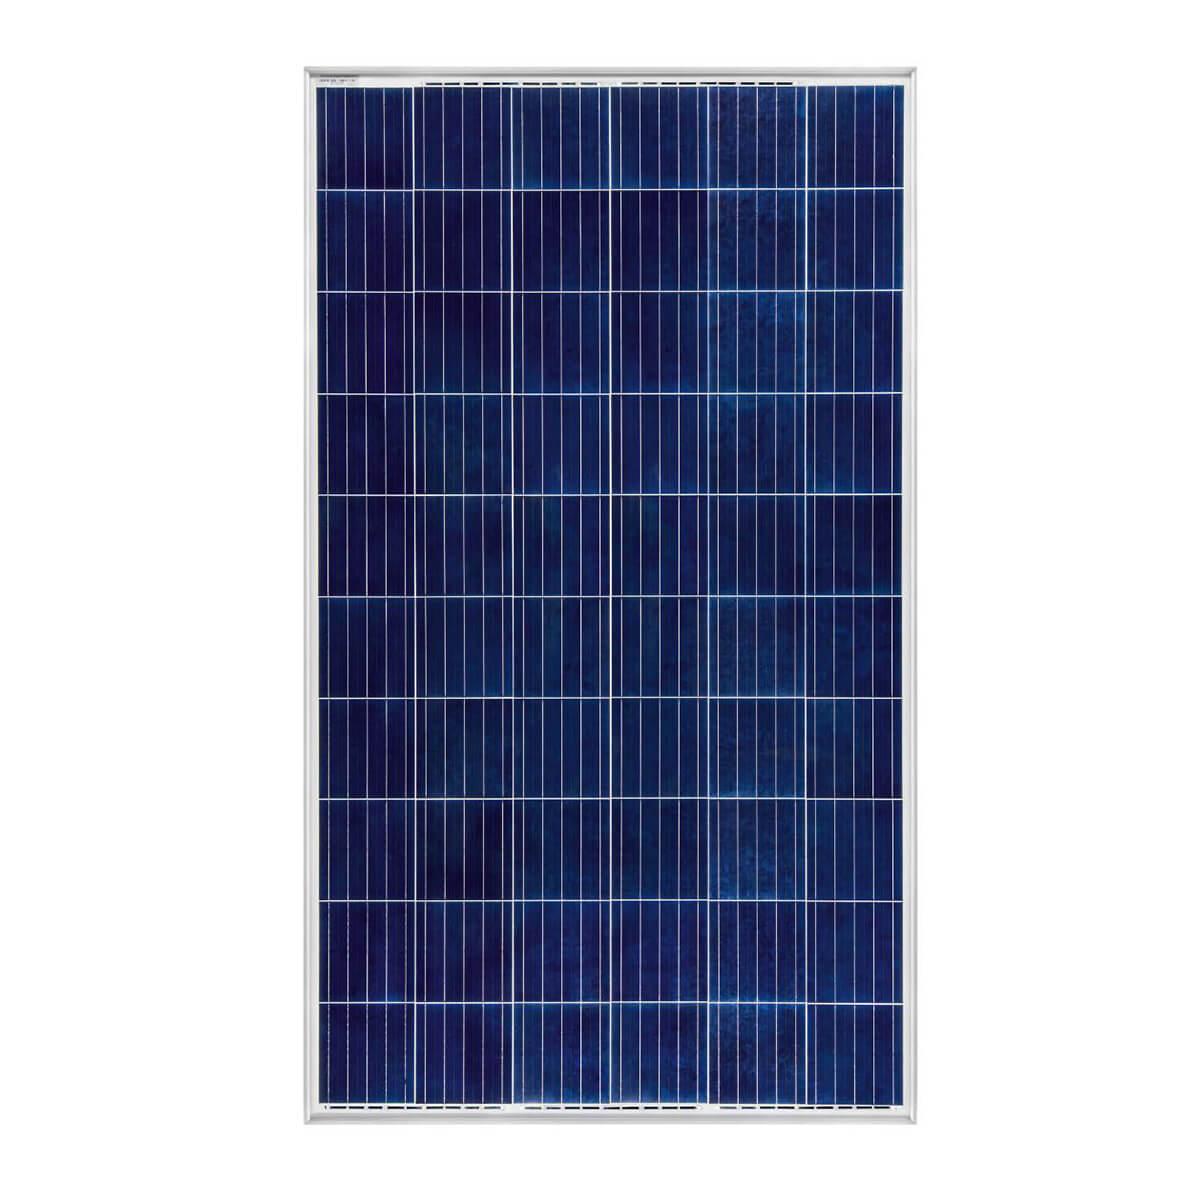 Odul solar 275W panel, odul solar 275Watt panel, Odul solar 275 W panel, odul solar 275 Watt panel, odul solar 275 Watt polikristal panel, Odul solar 275 W watt gunes paneli, odul solar 275 W watt polikristal gunes paneli, odul solar 275 W Watt fotovoltaik polikristal solar panel, odul solar 275W polikristal gunes enerjisi, odul solar OSP60-275W panel